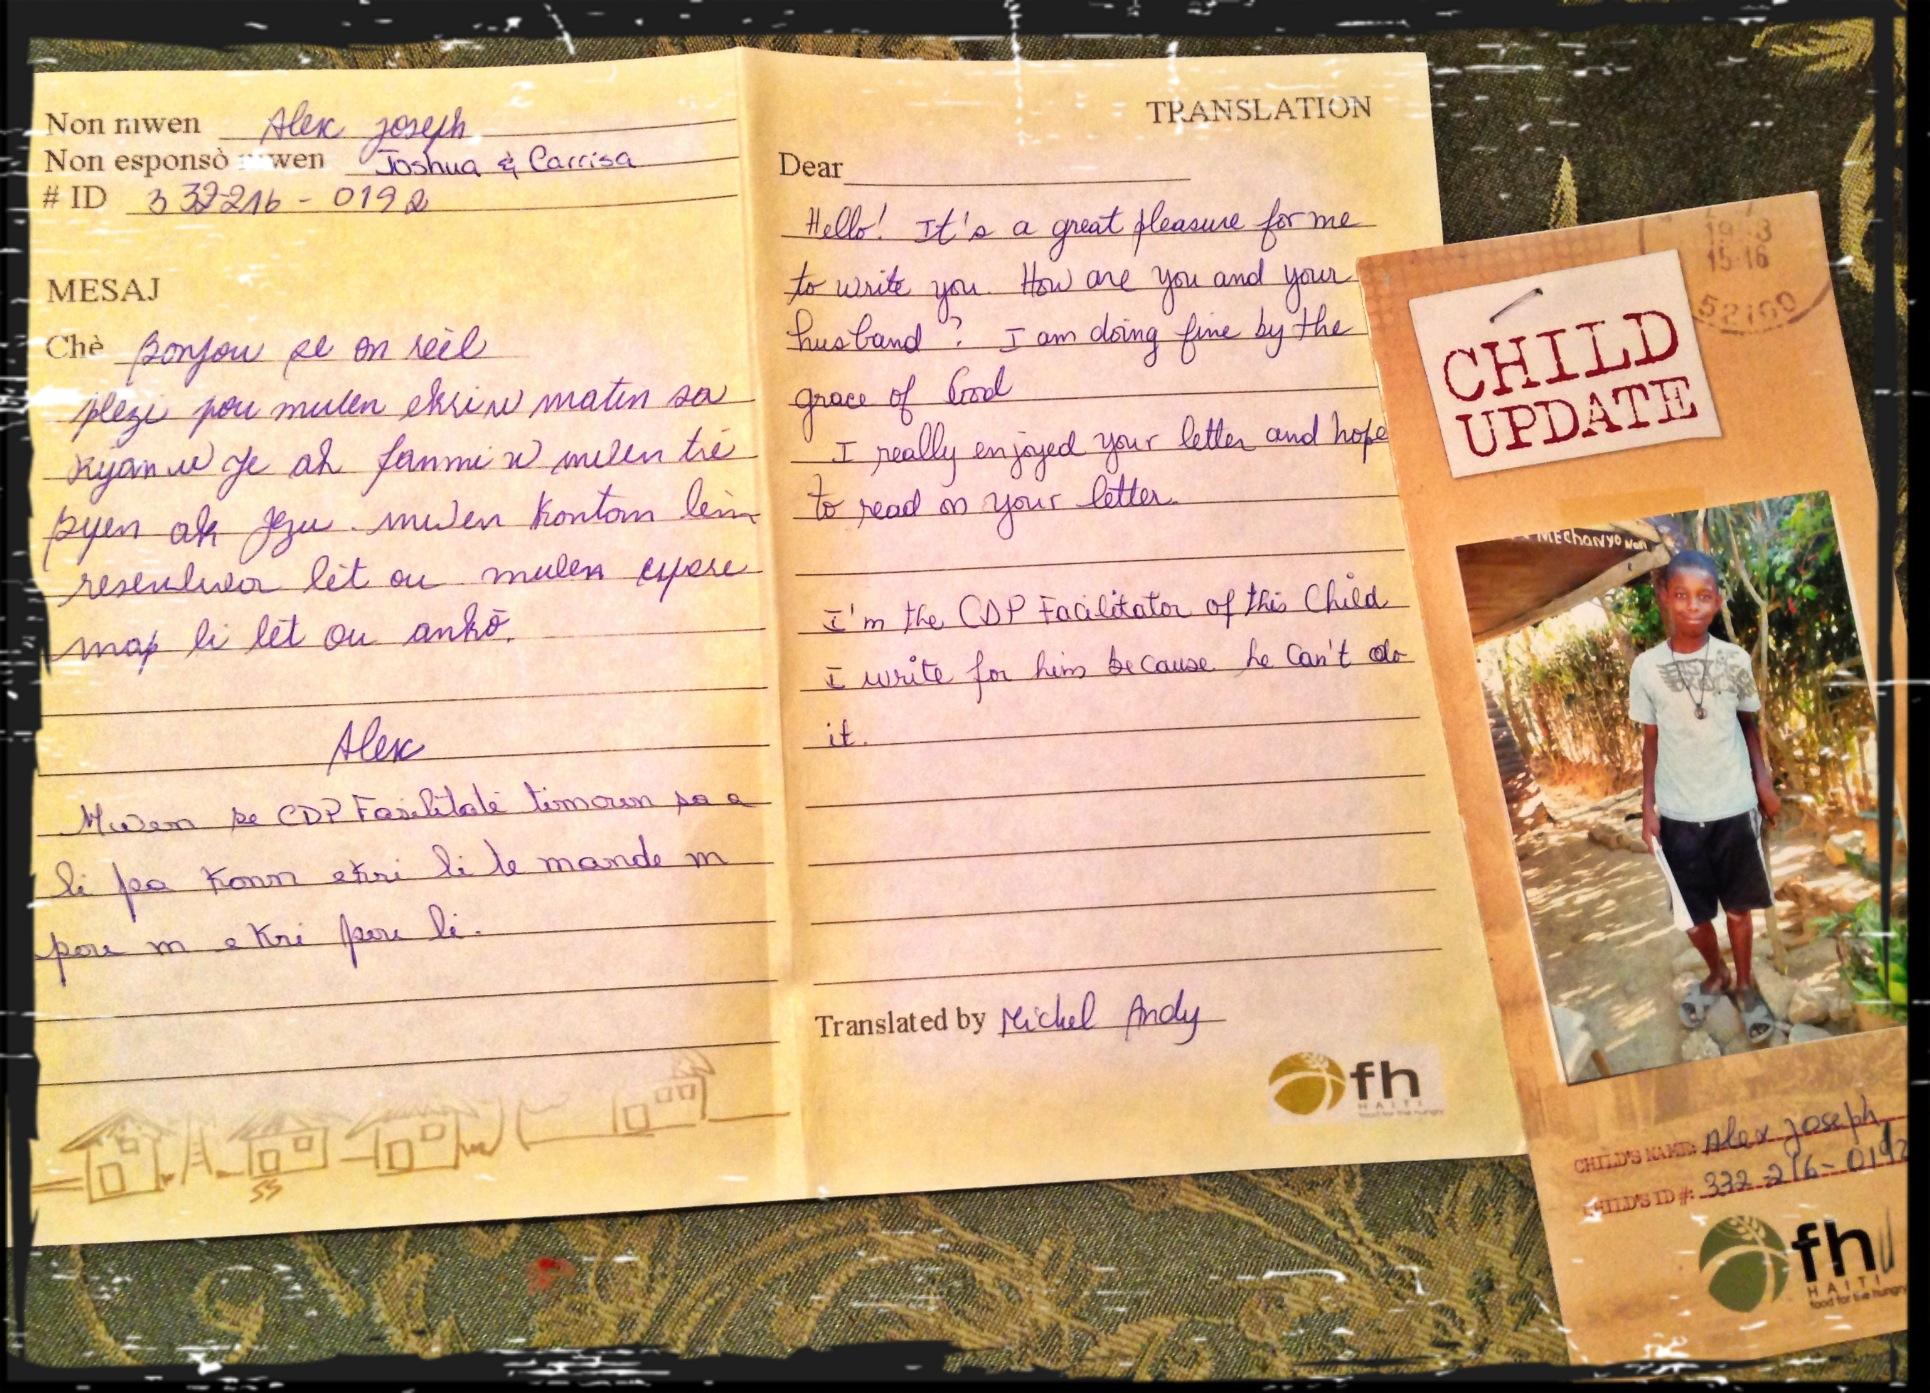 Letter to Sponsor Child Sponsor Letter 3 Ways to Give